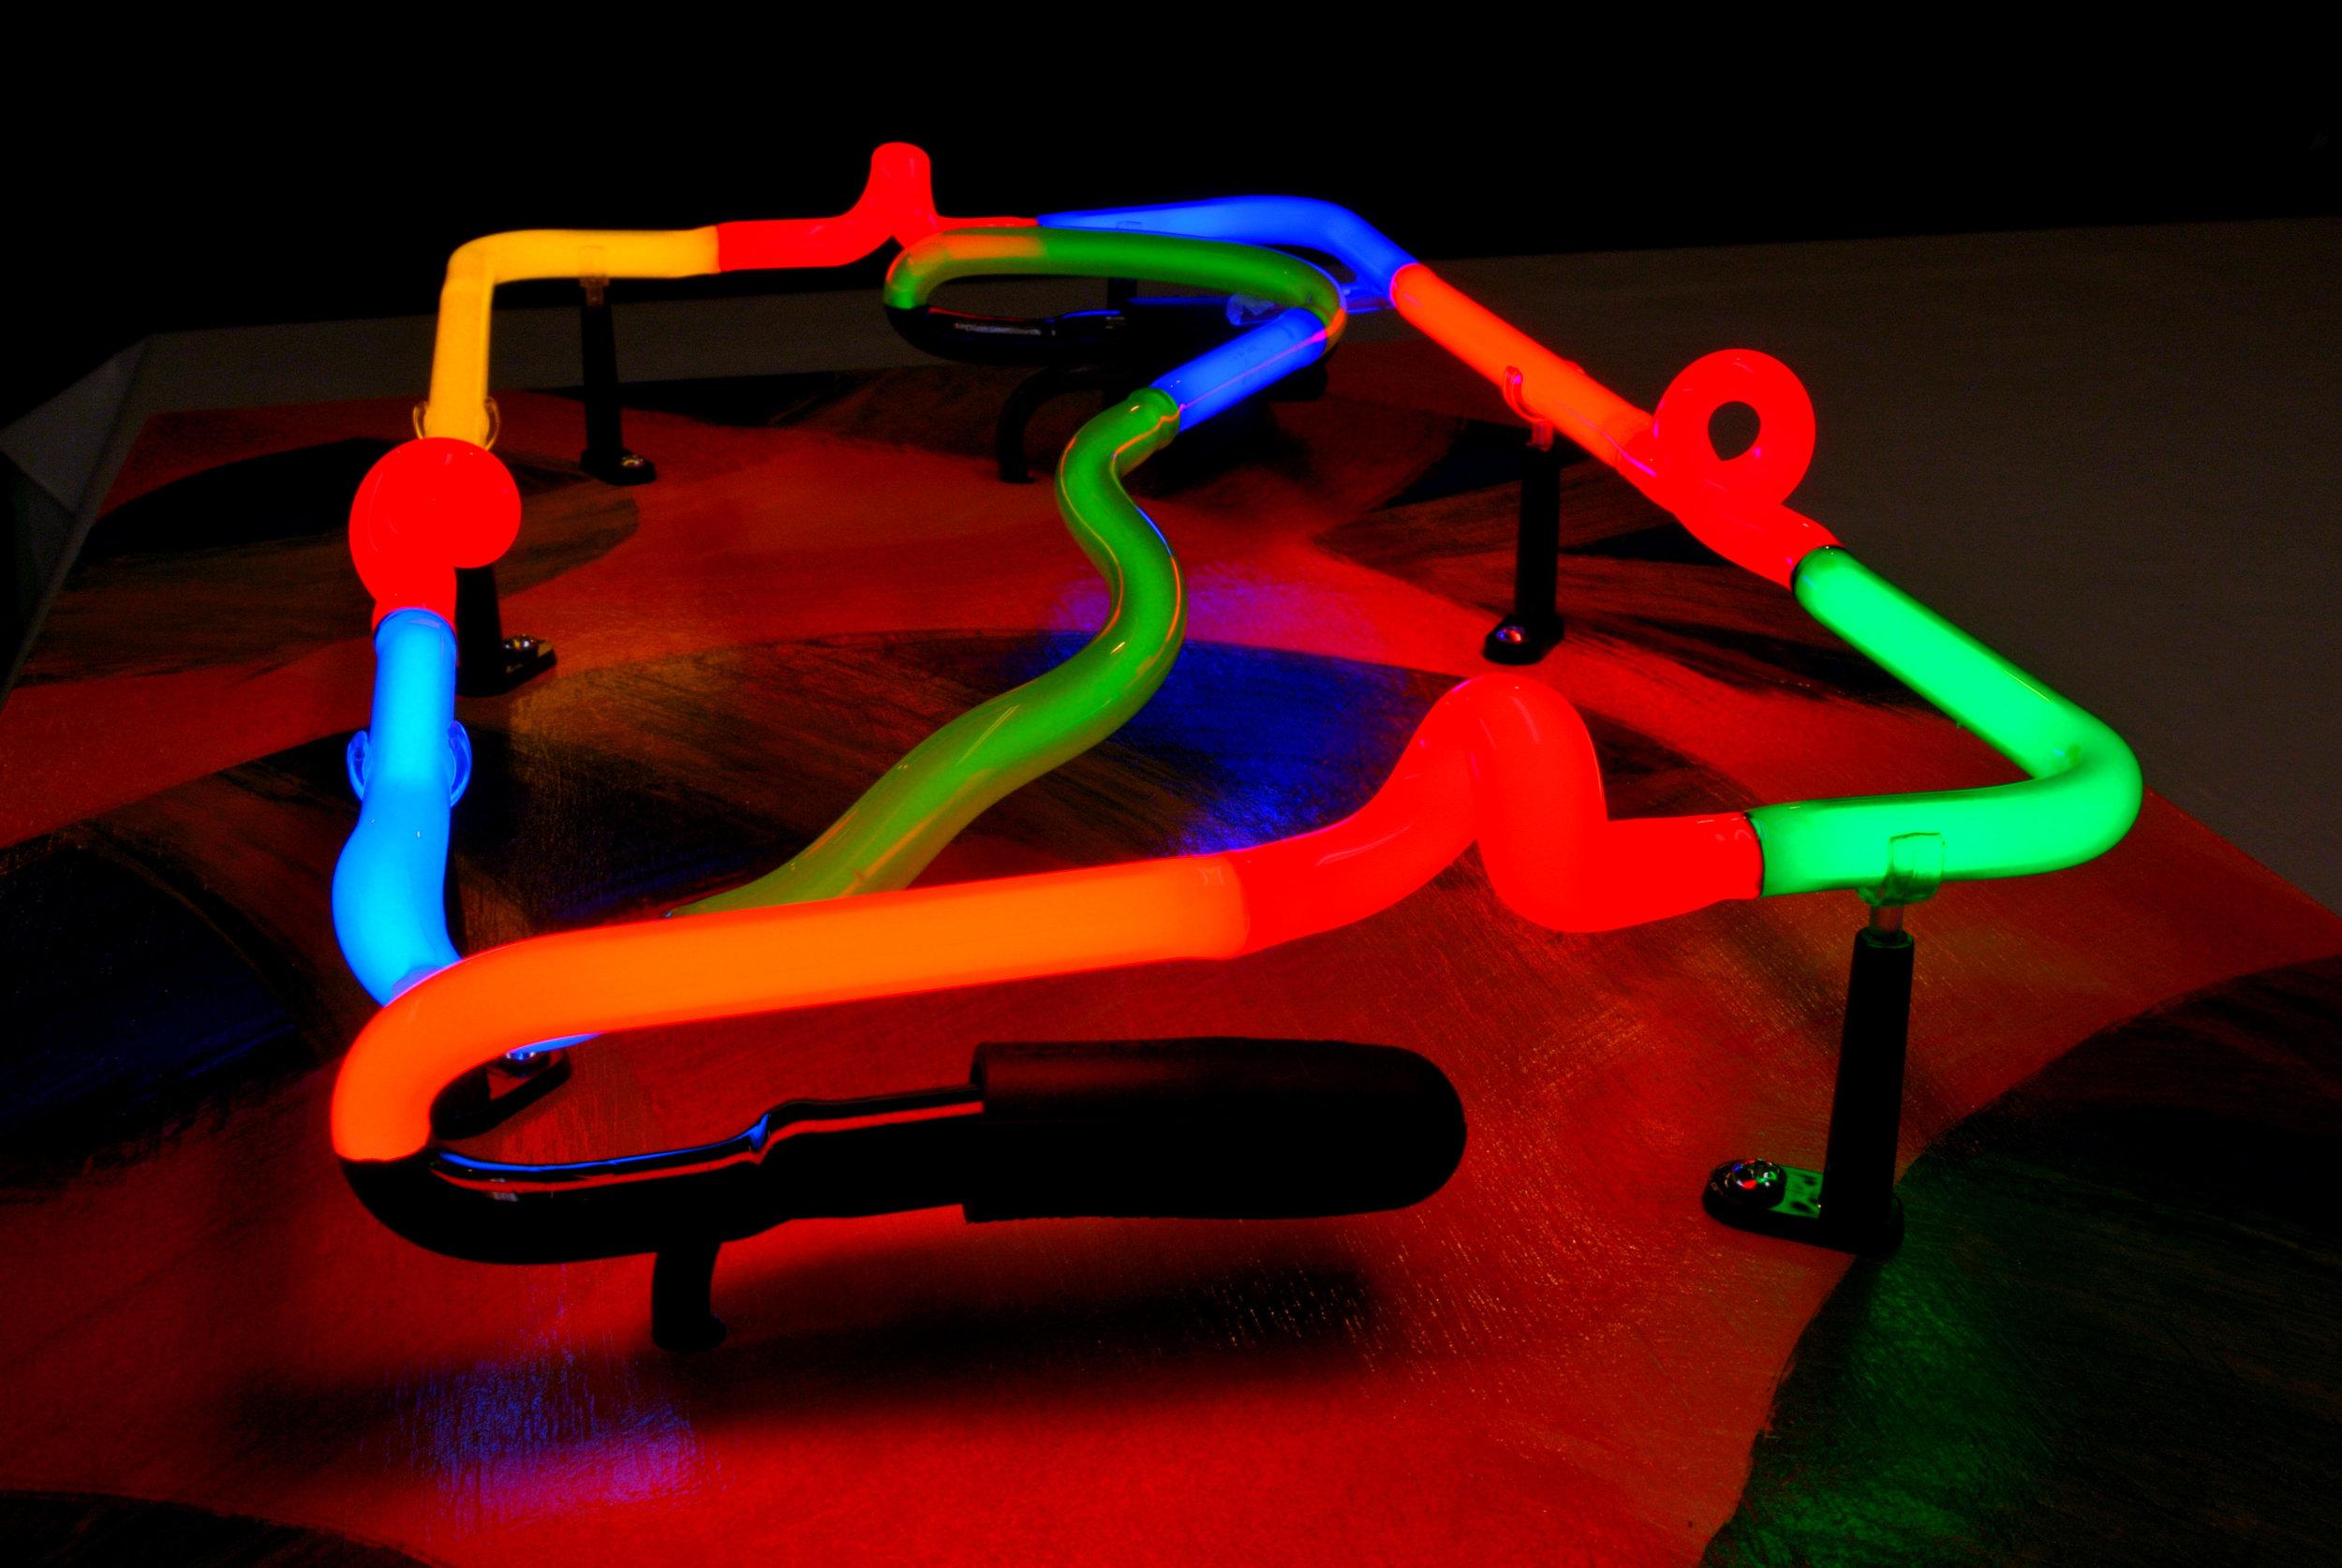 Stained Italian Glass Neon Artworks by John Barton - BartonNeonMagic.com